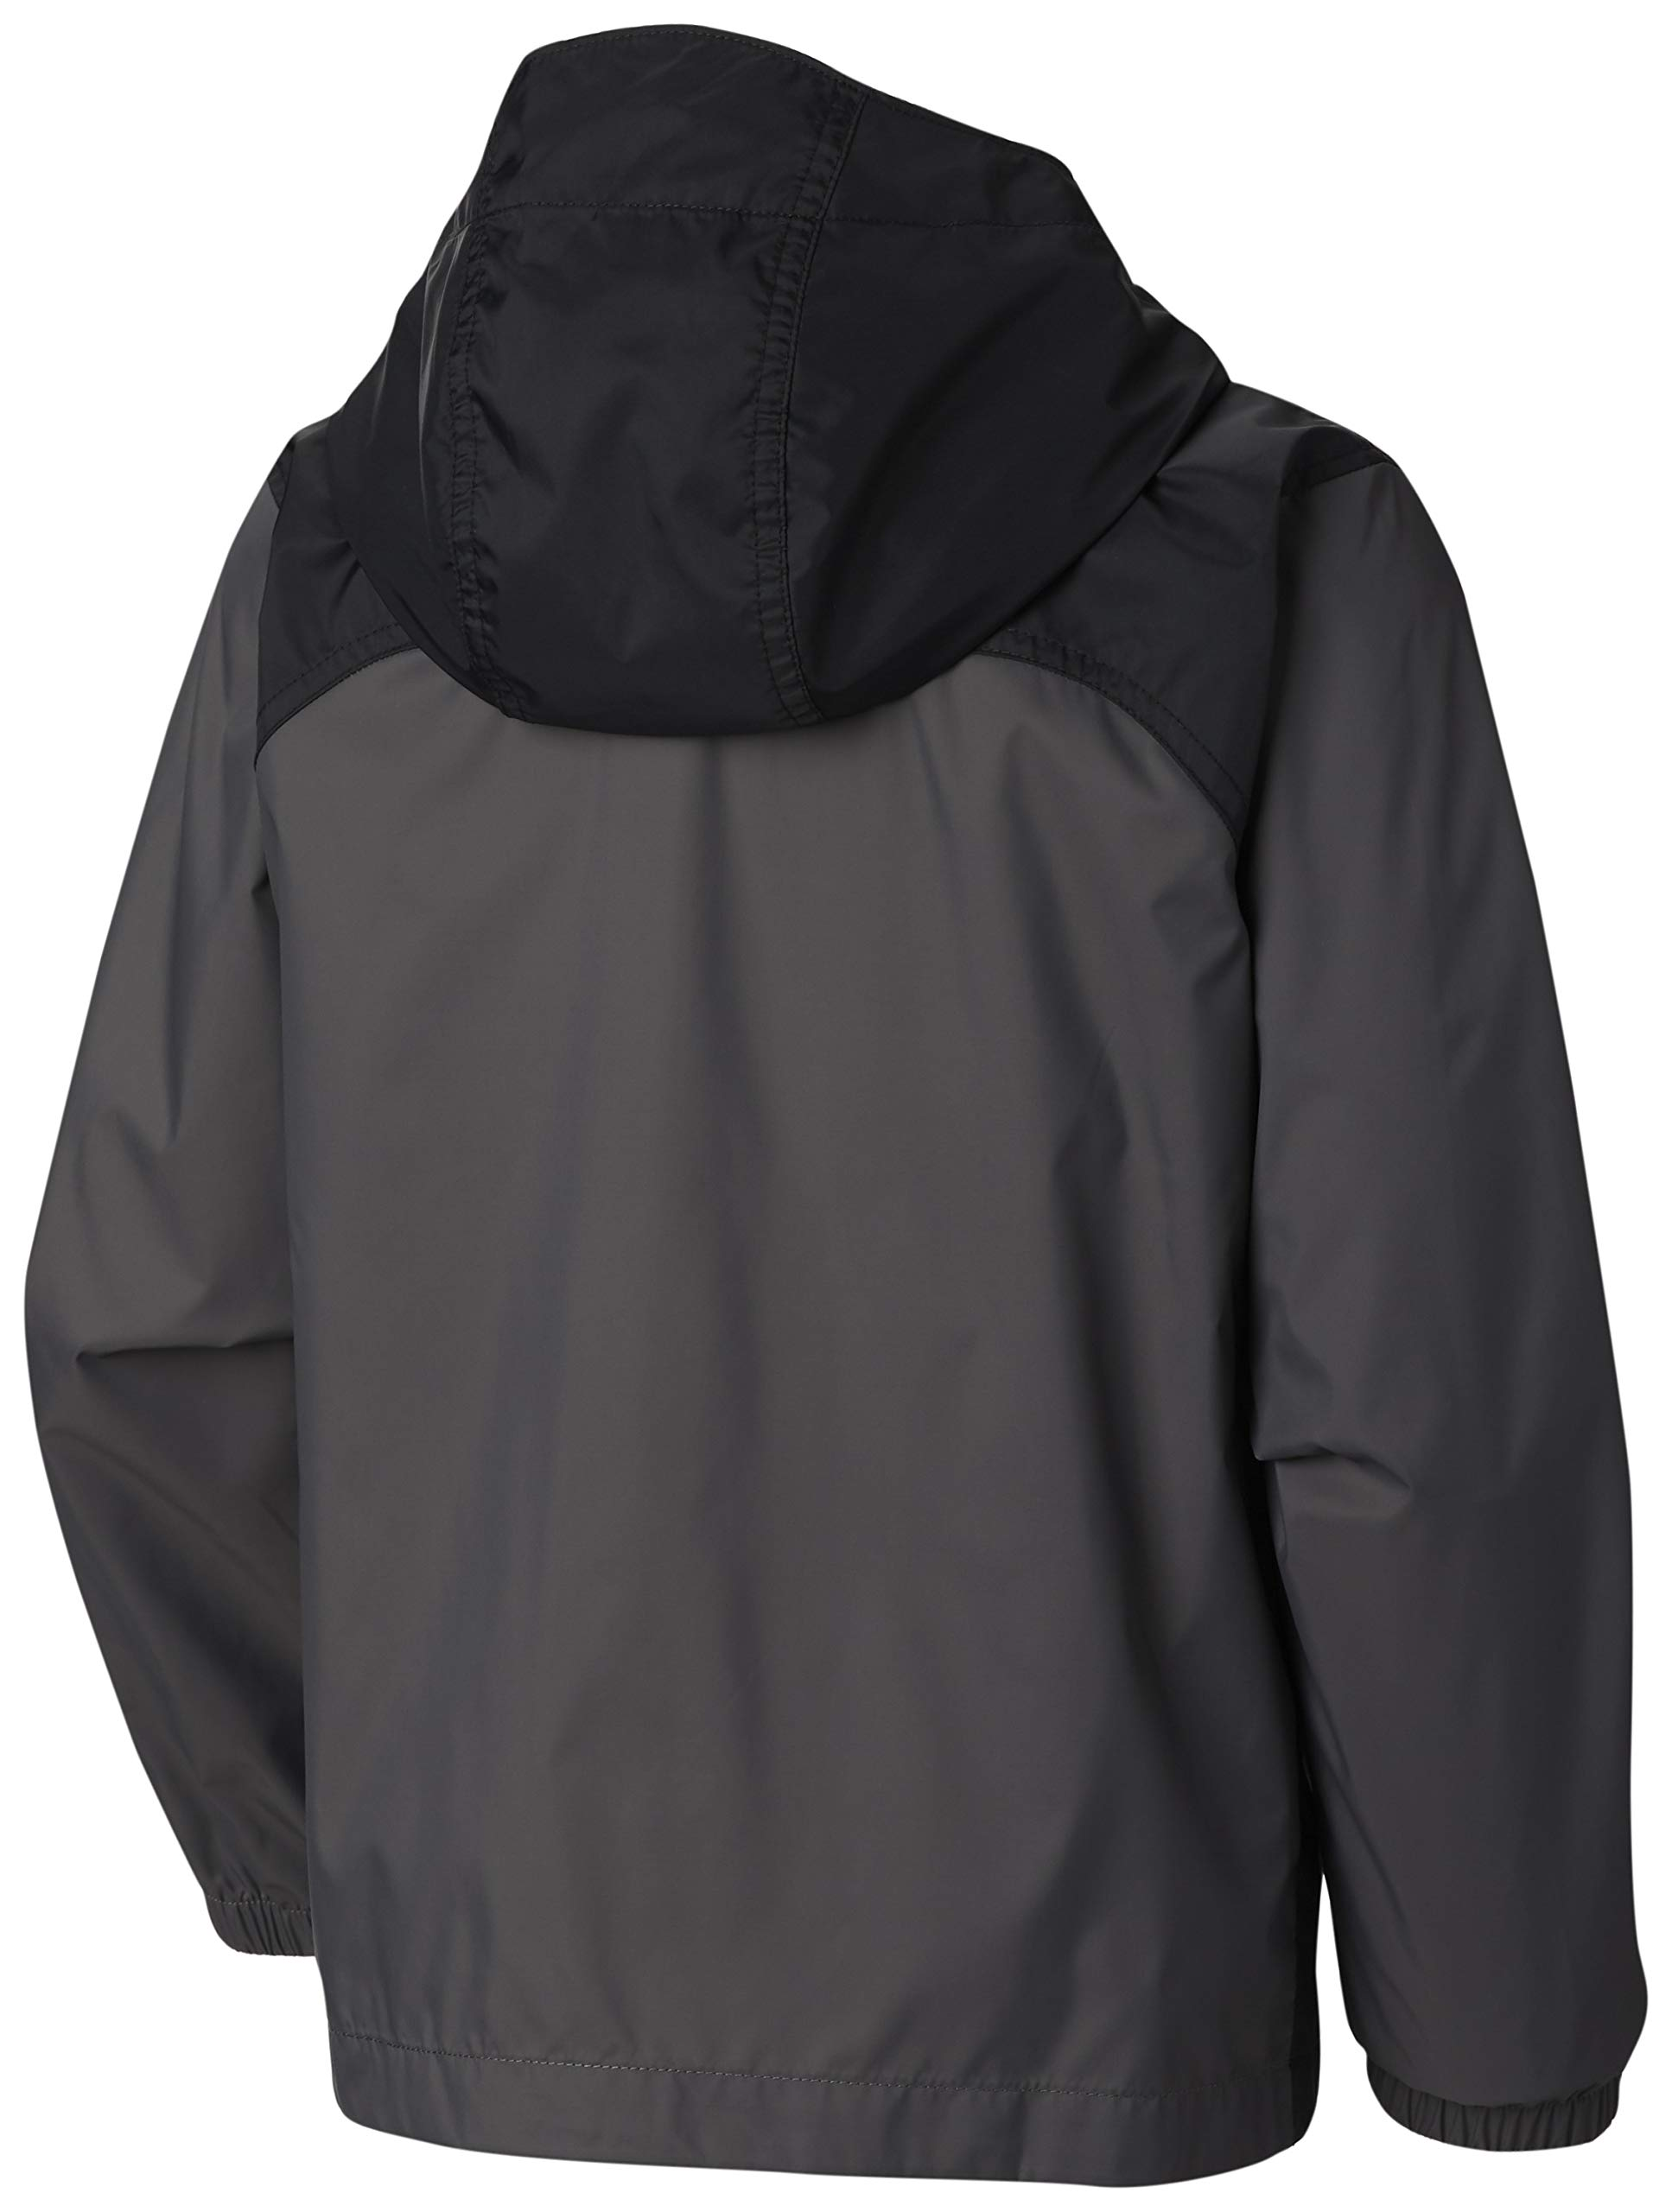 Columbia Boys' Little Glennaker Rain Jacket, Grill/Black X-Small by Columbia (Image #2)